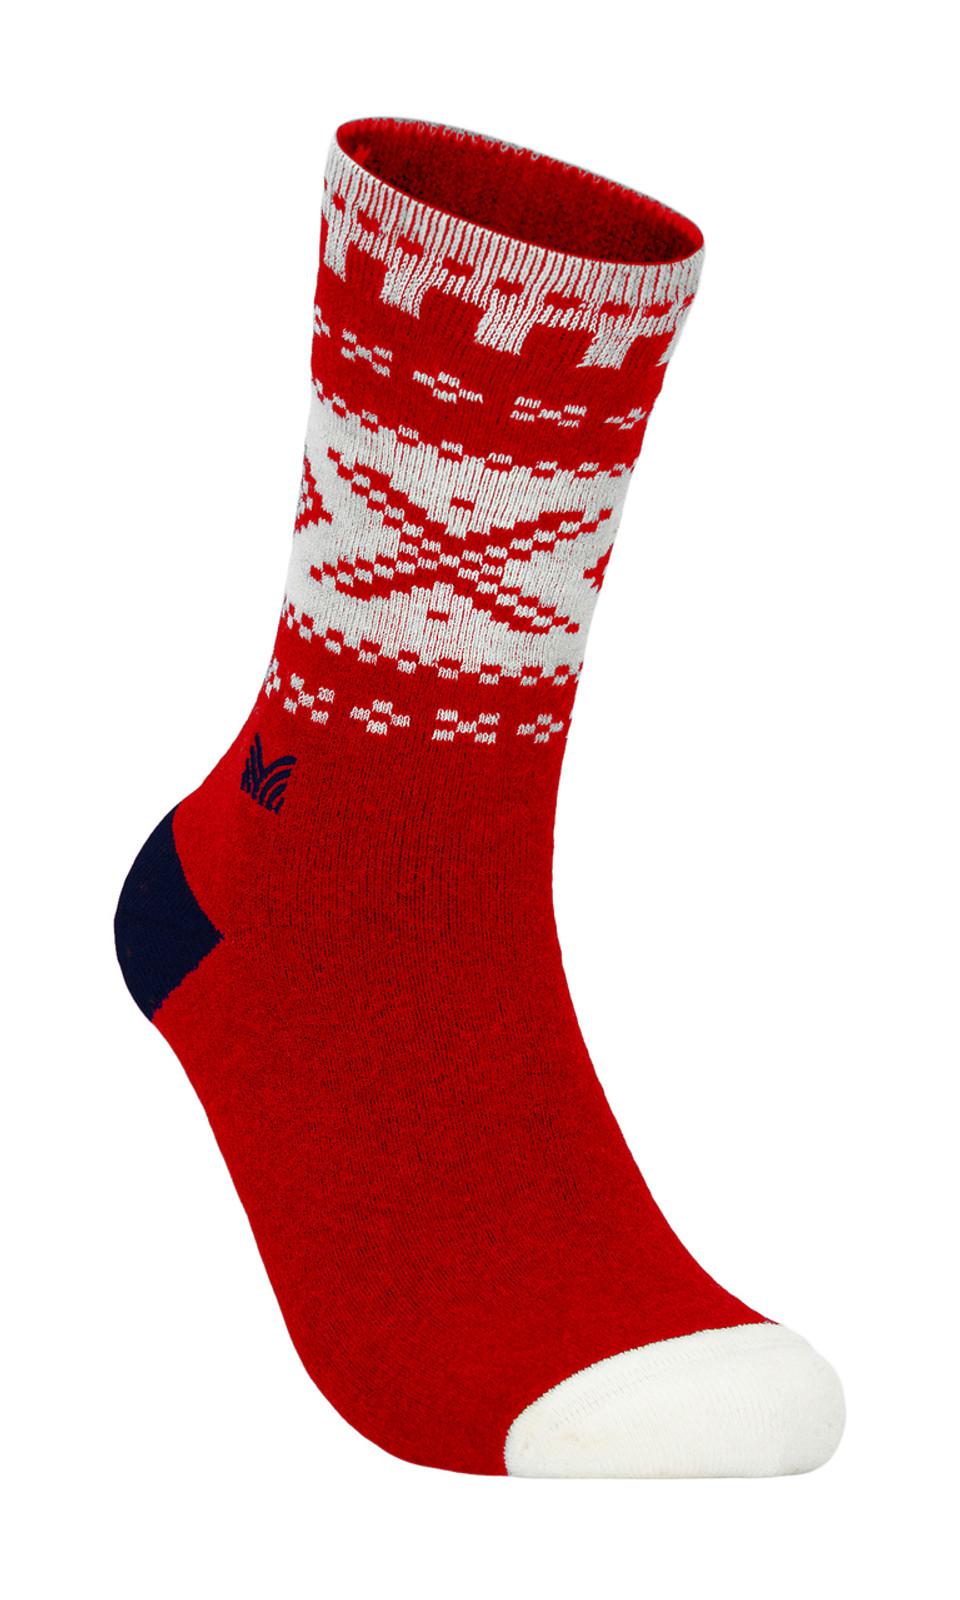 Dale of Norway Cortina Sock, Raspberry/Off White/Navy, 50101B